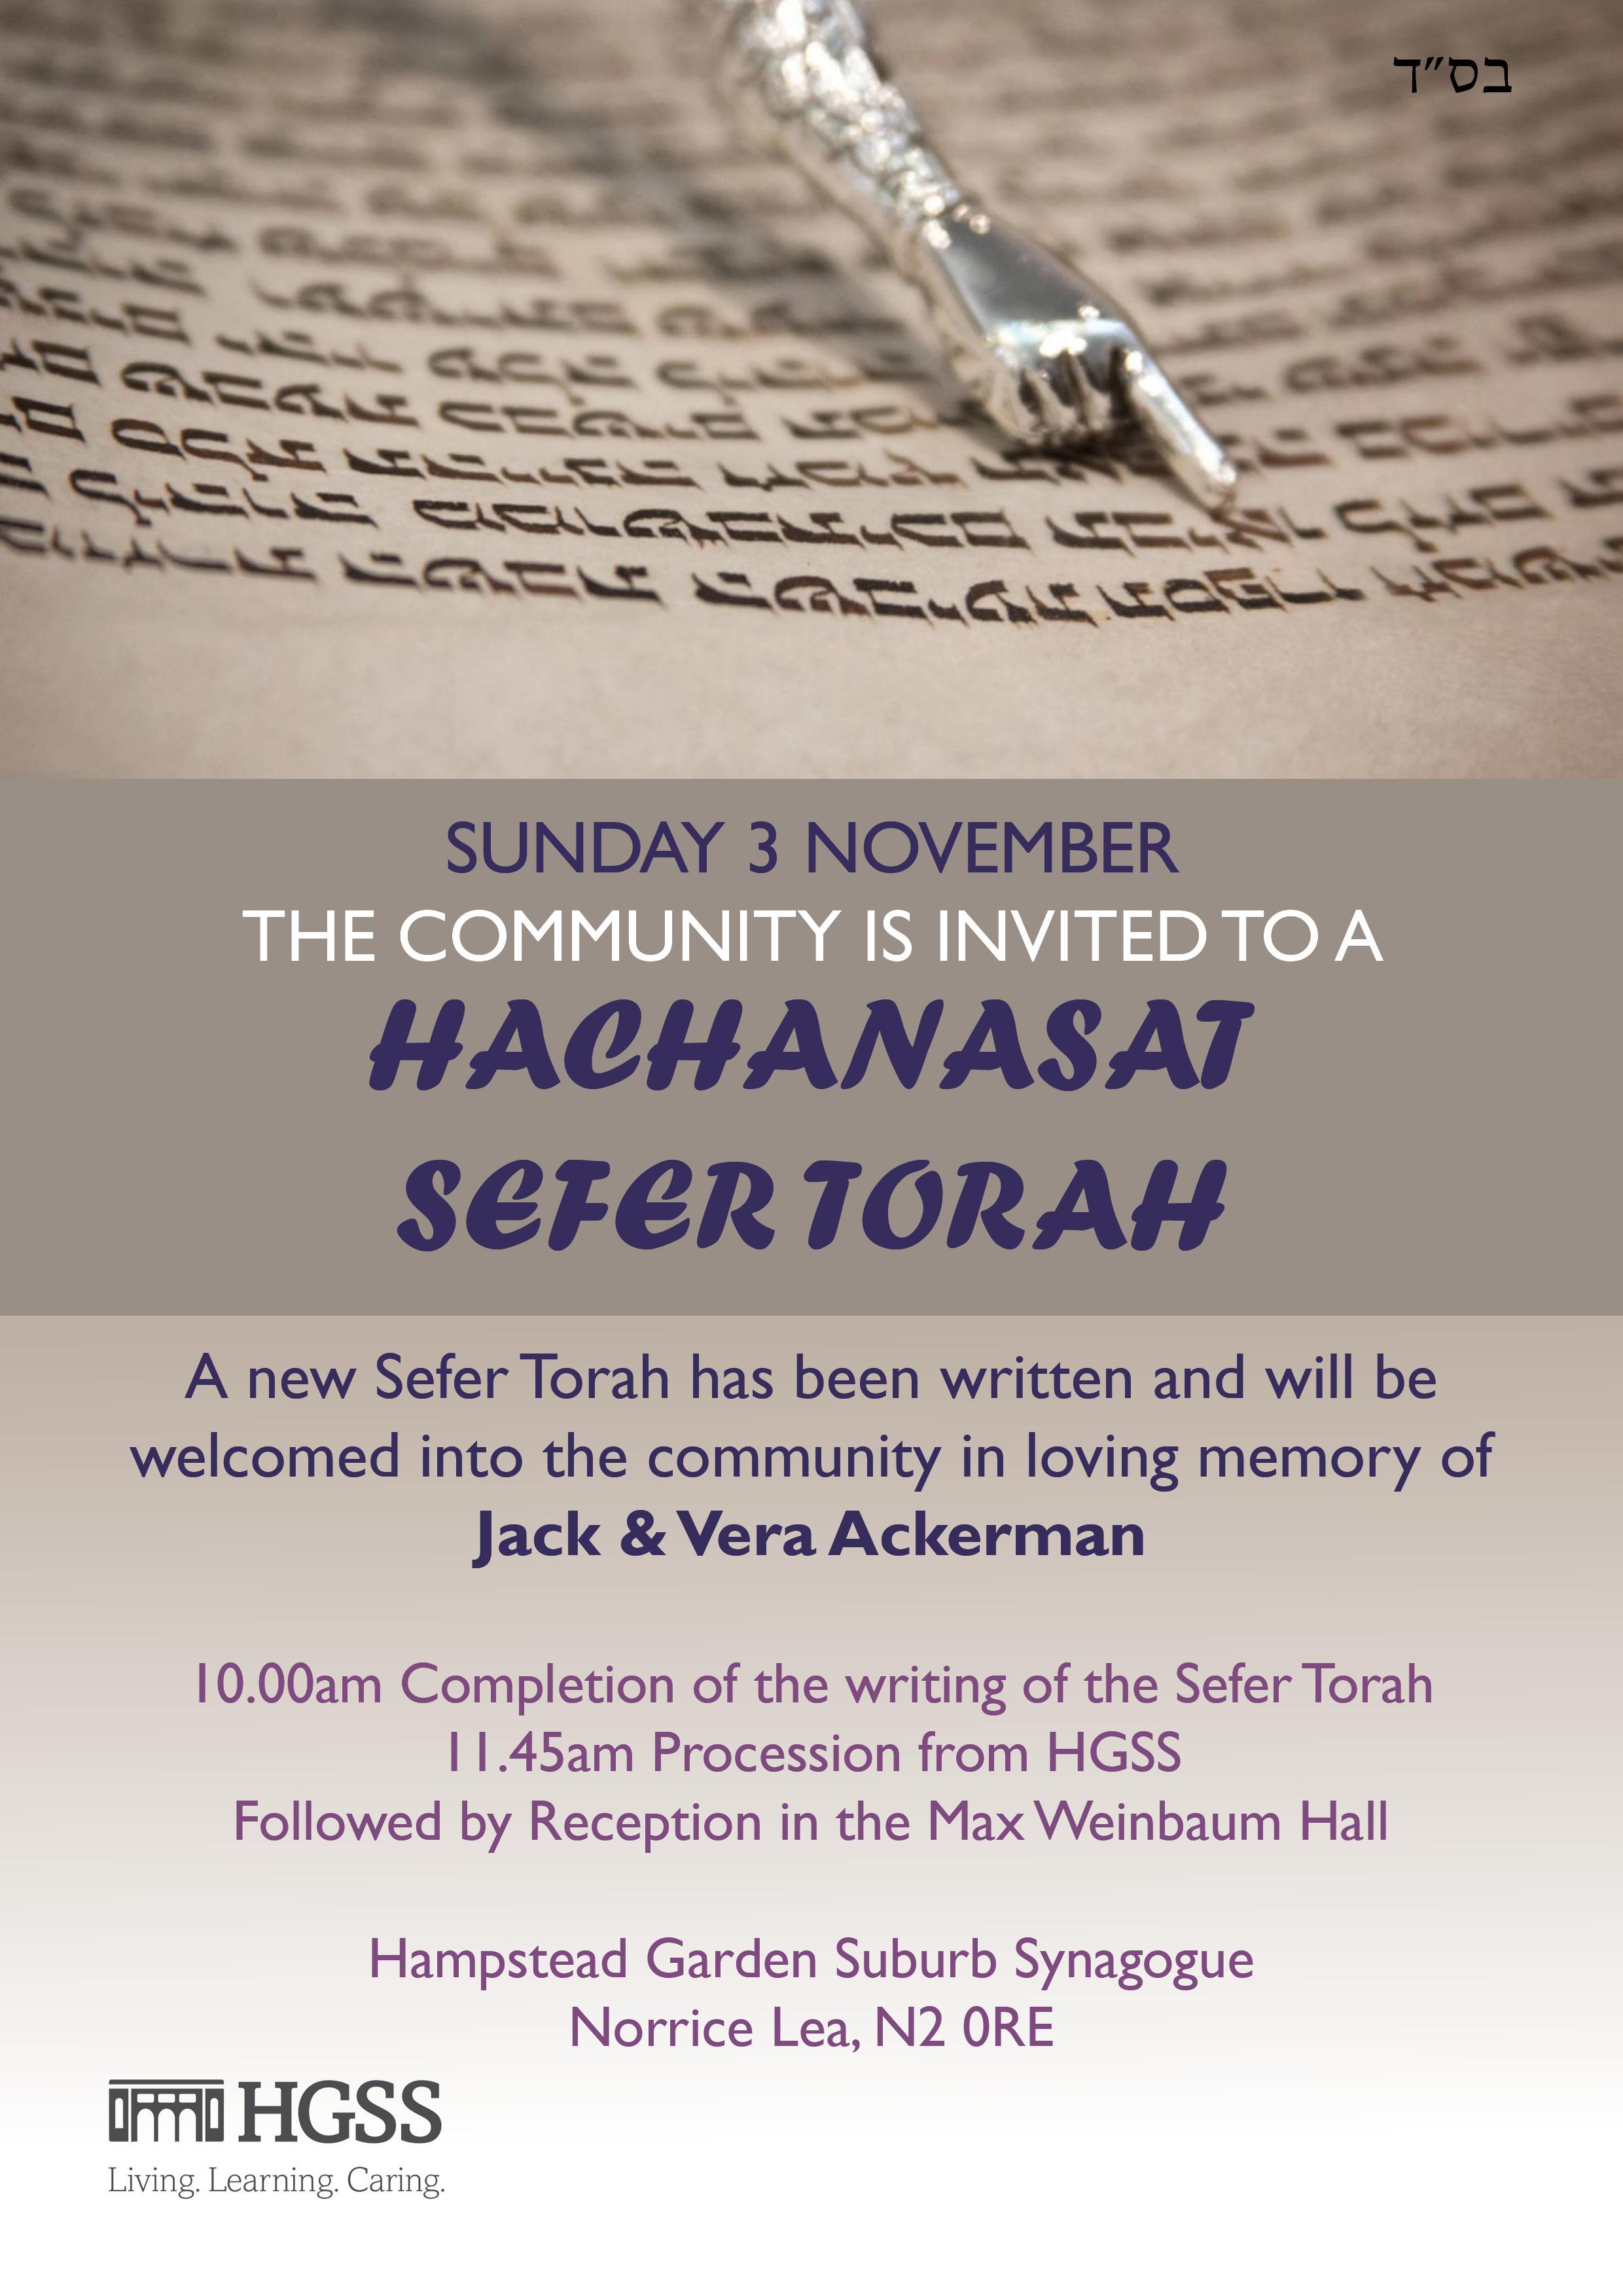 Hachanasat Sefer Torah @ HGSS